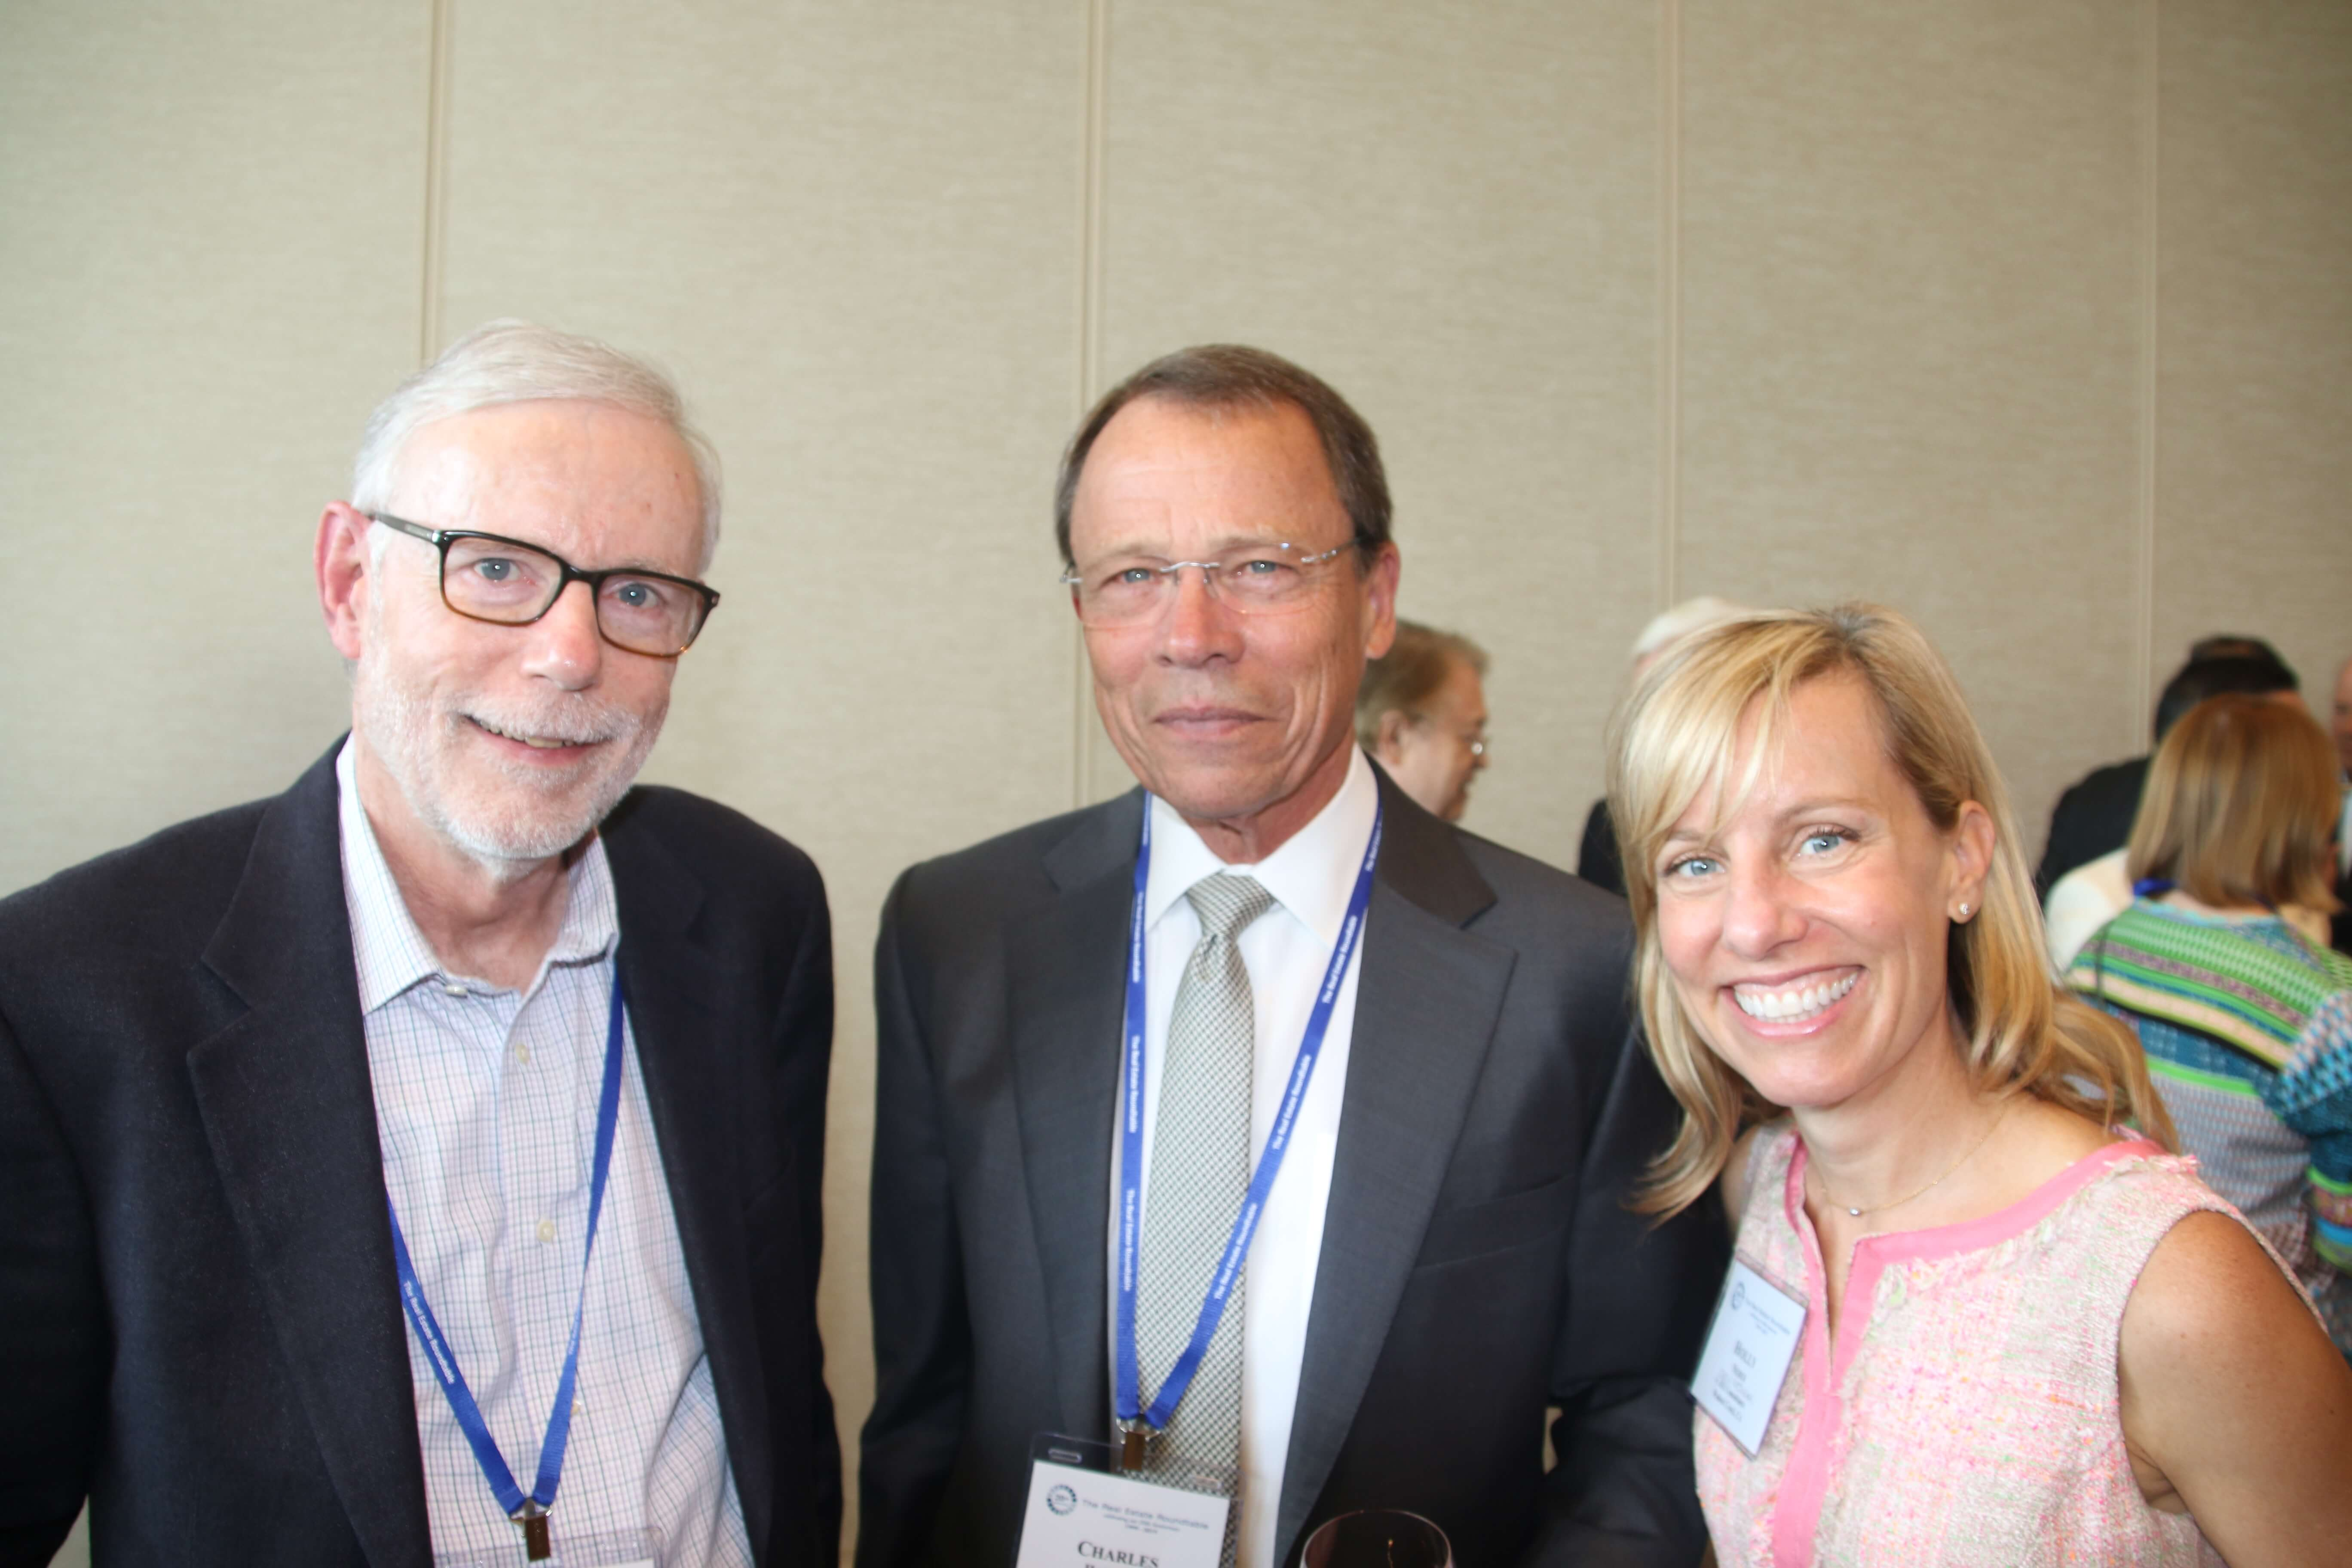 Bruce MacEwen (Portman Financial, LLC), Charles Harrison (REIT Funding, LLC), Holly Neber (AEI Consultants)